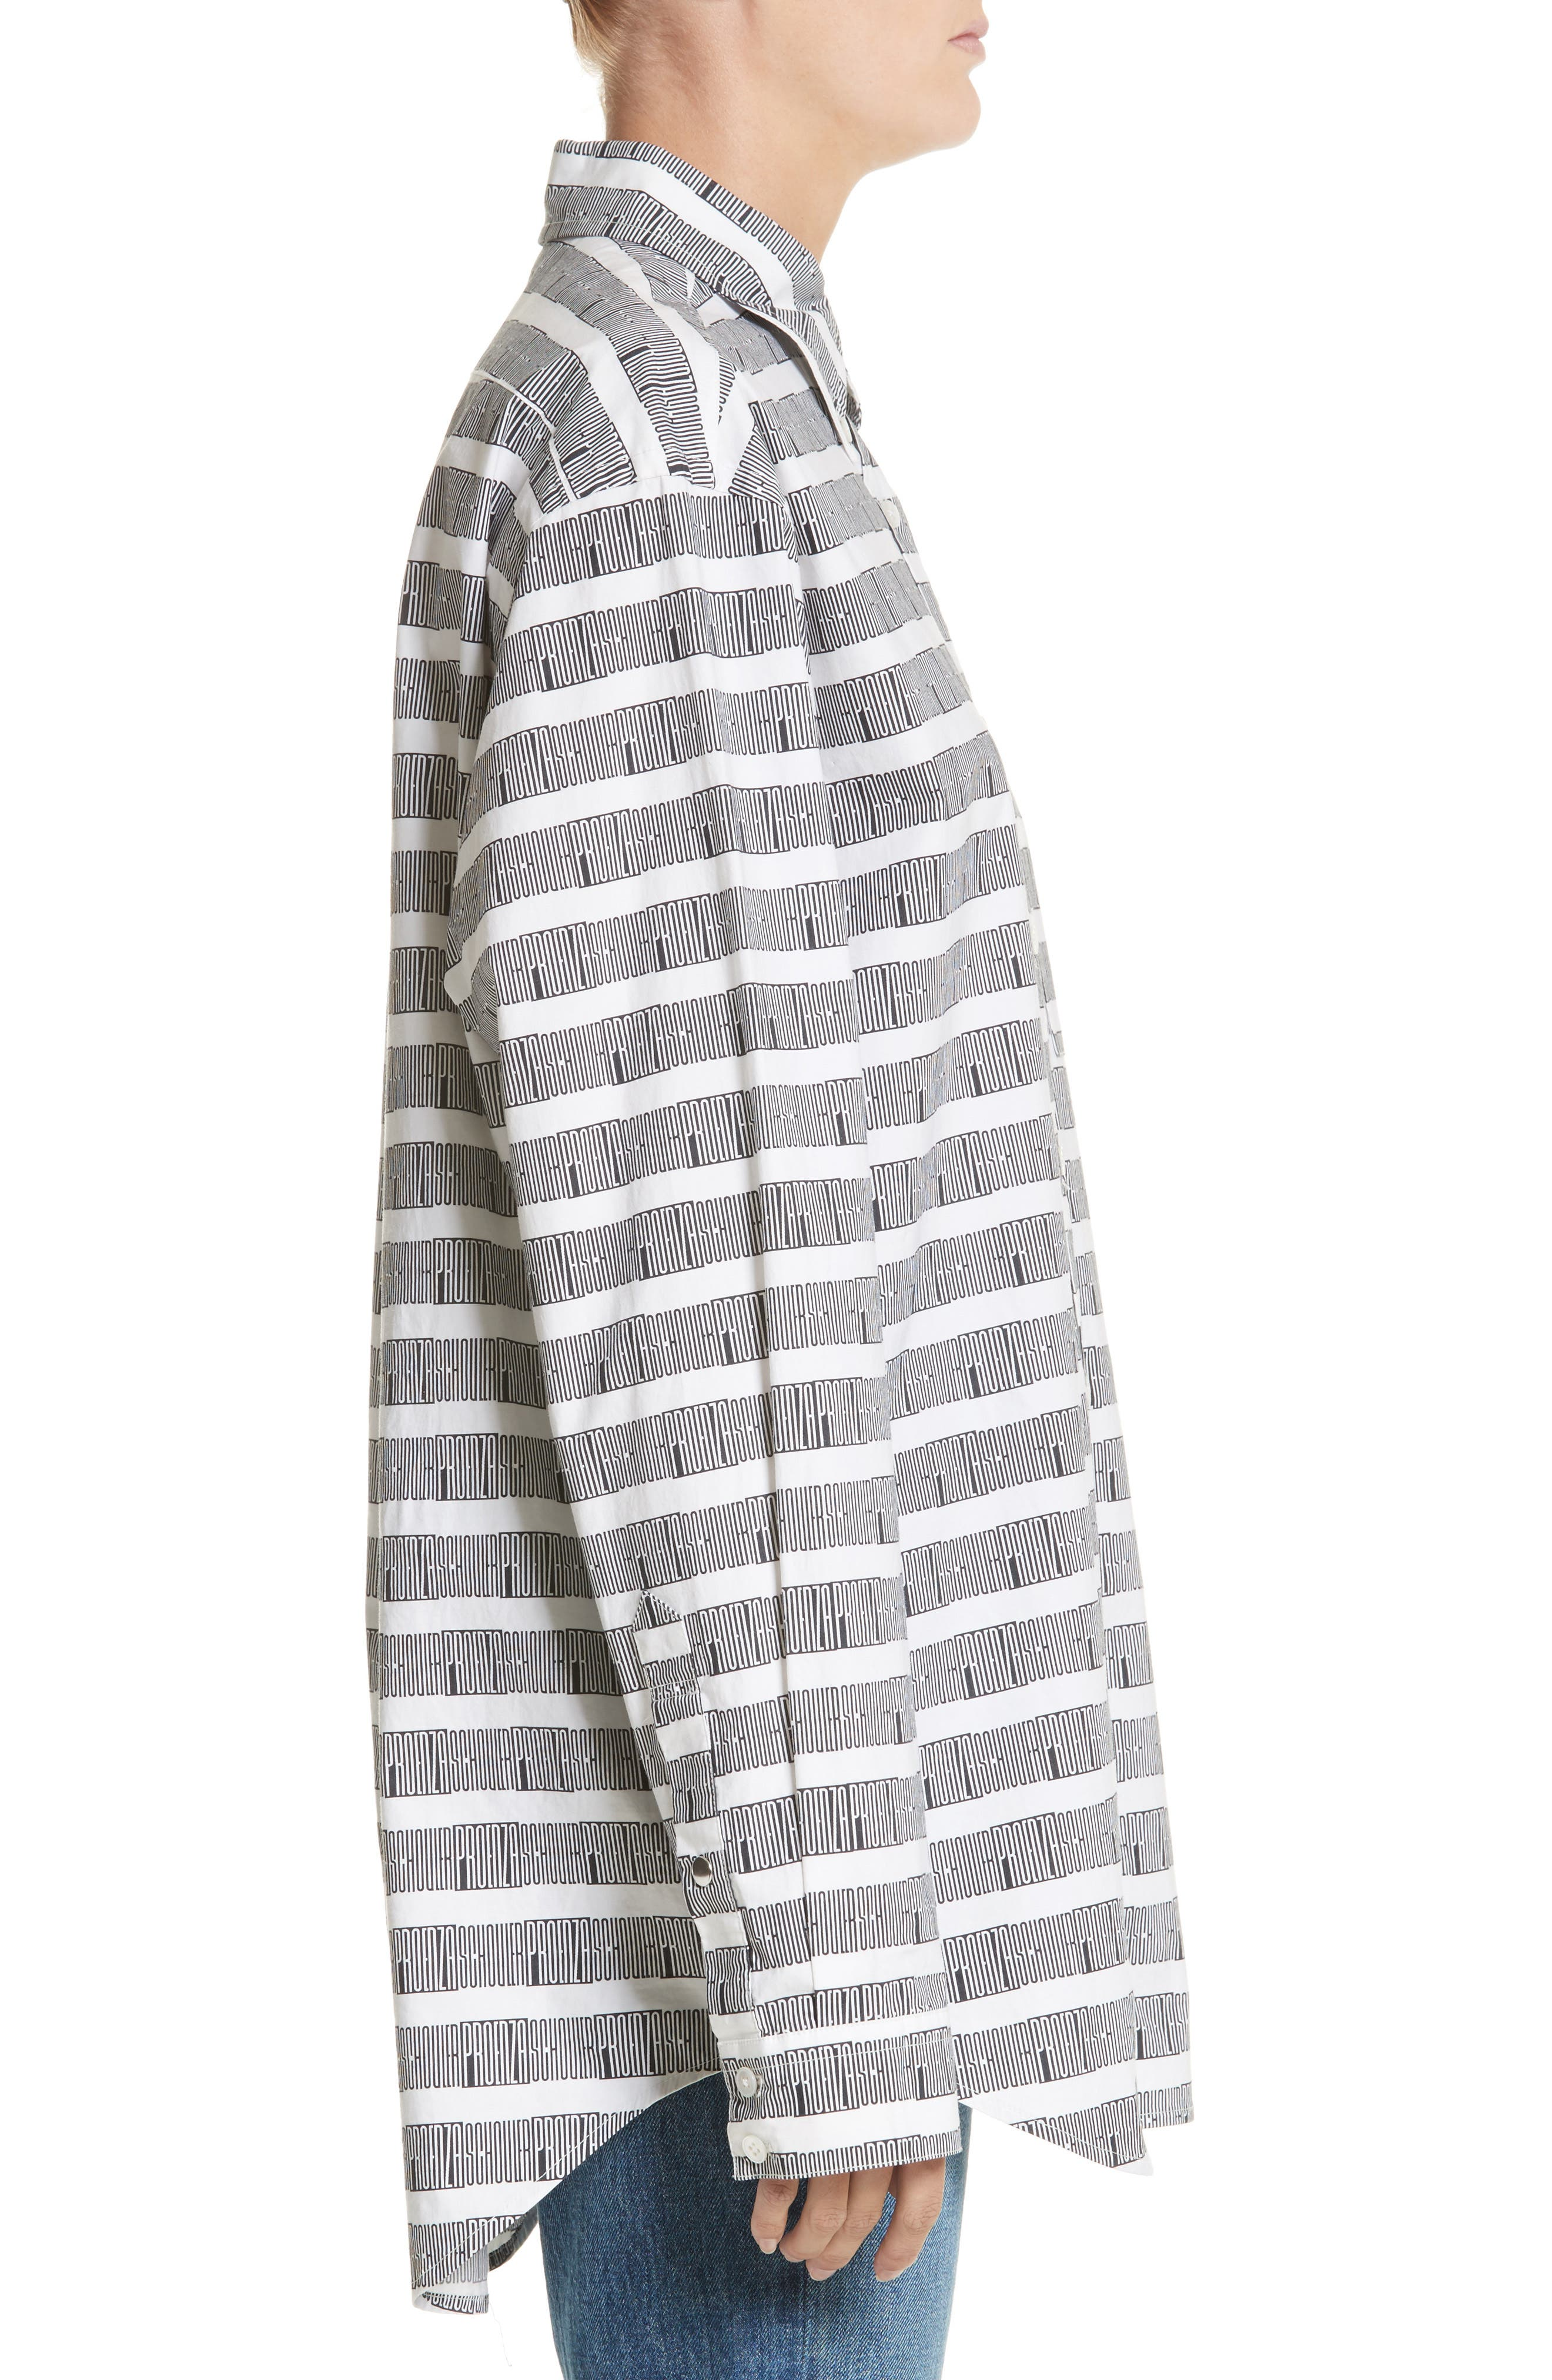 PSWL Graphic Stripe Cotton Top,                             Alternate thumbnail 3, color,